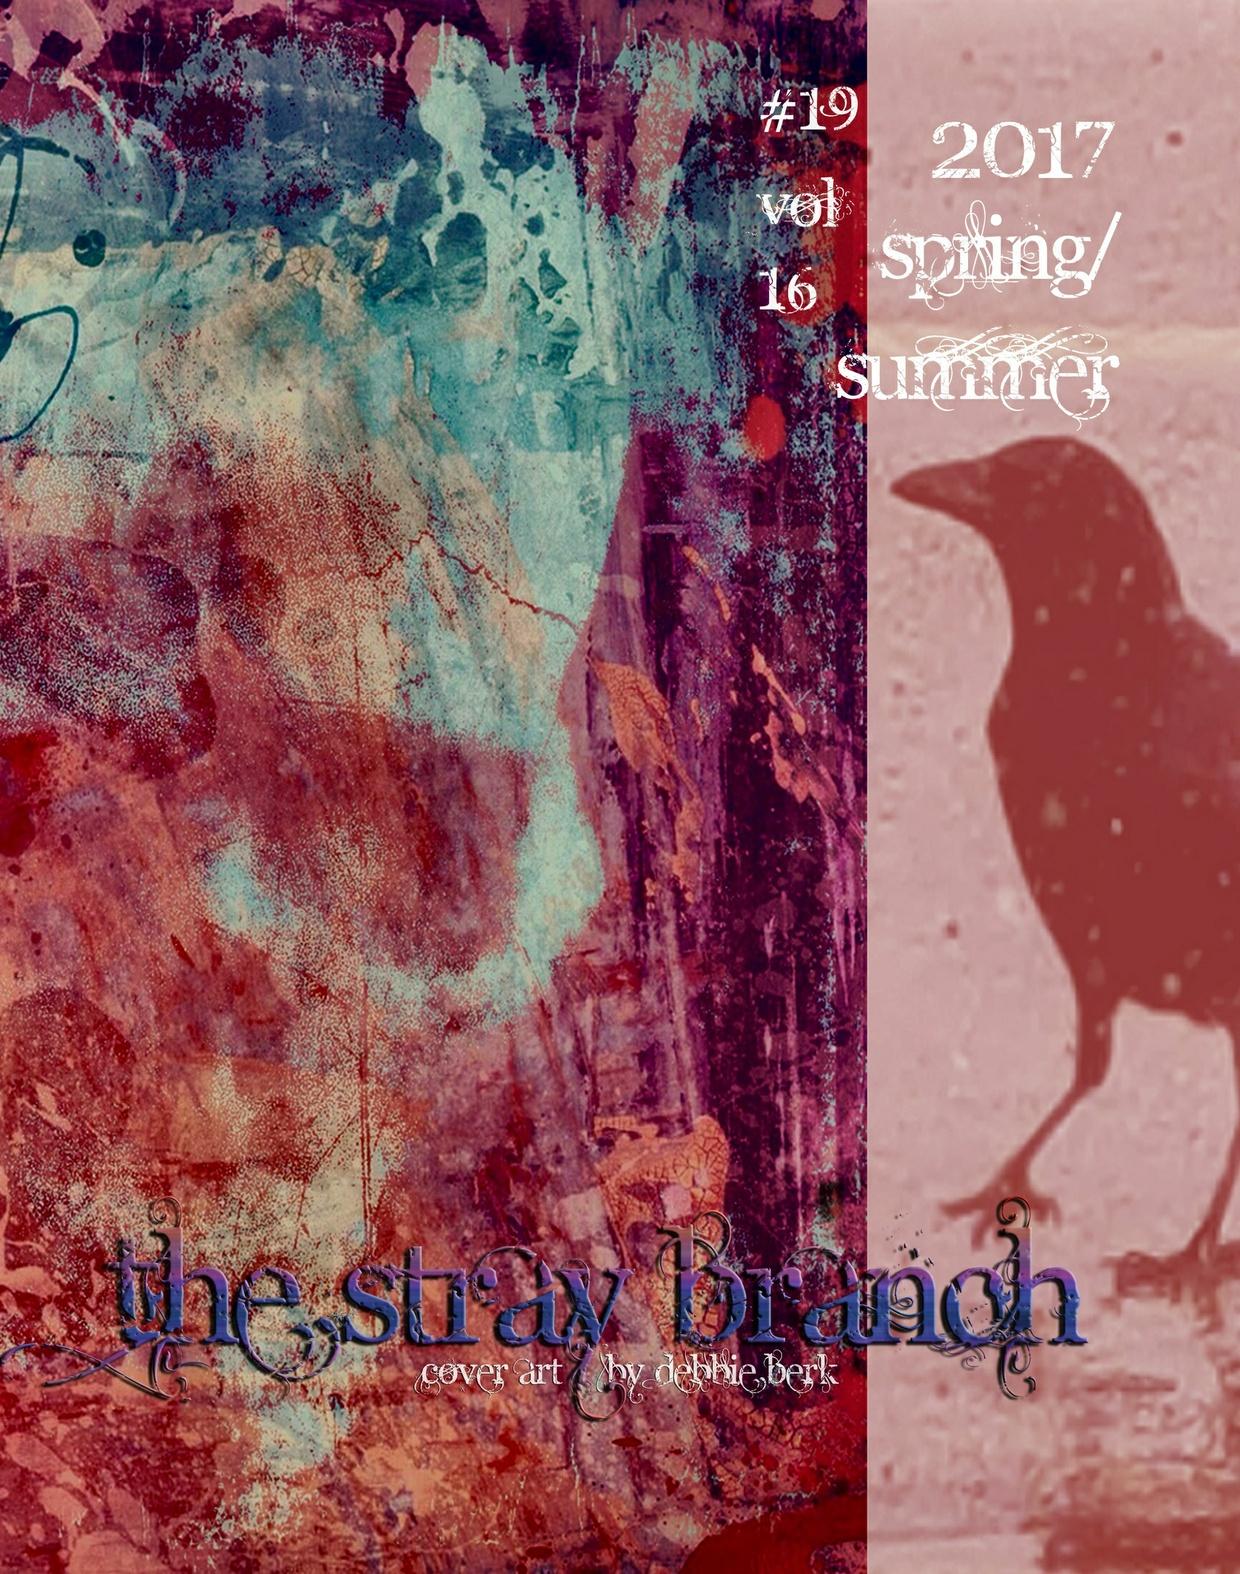 The Stray Branch Spring/Summer 2017 #19 Vol 16